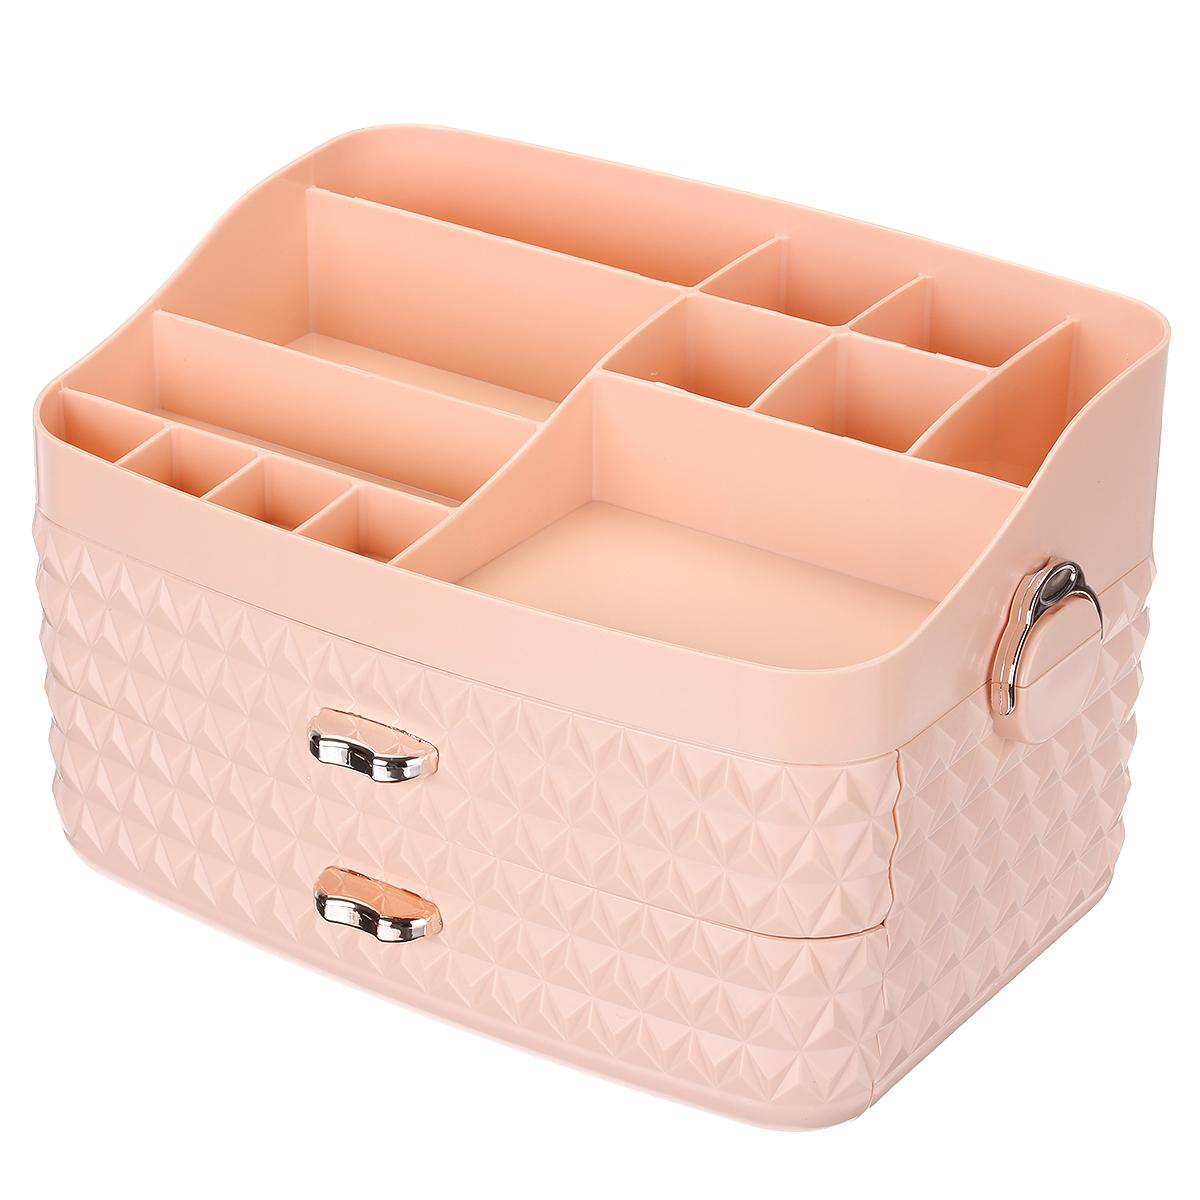 Dustproof Cosmetic Storage Box with Drawer Large Capacity Desktop Furnishings Organizer Home Desk Sundries Storage